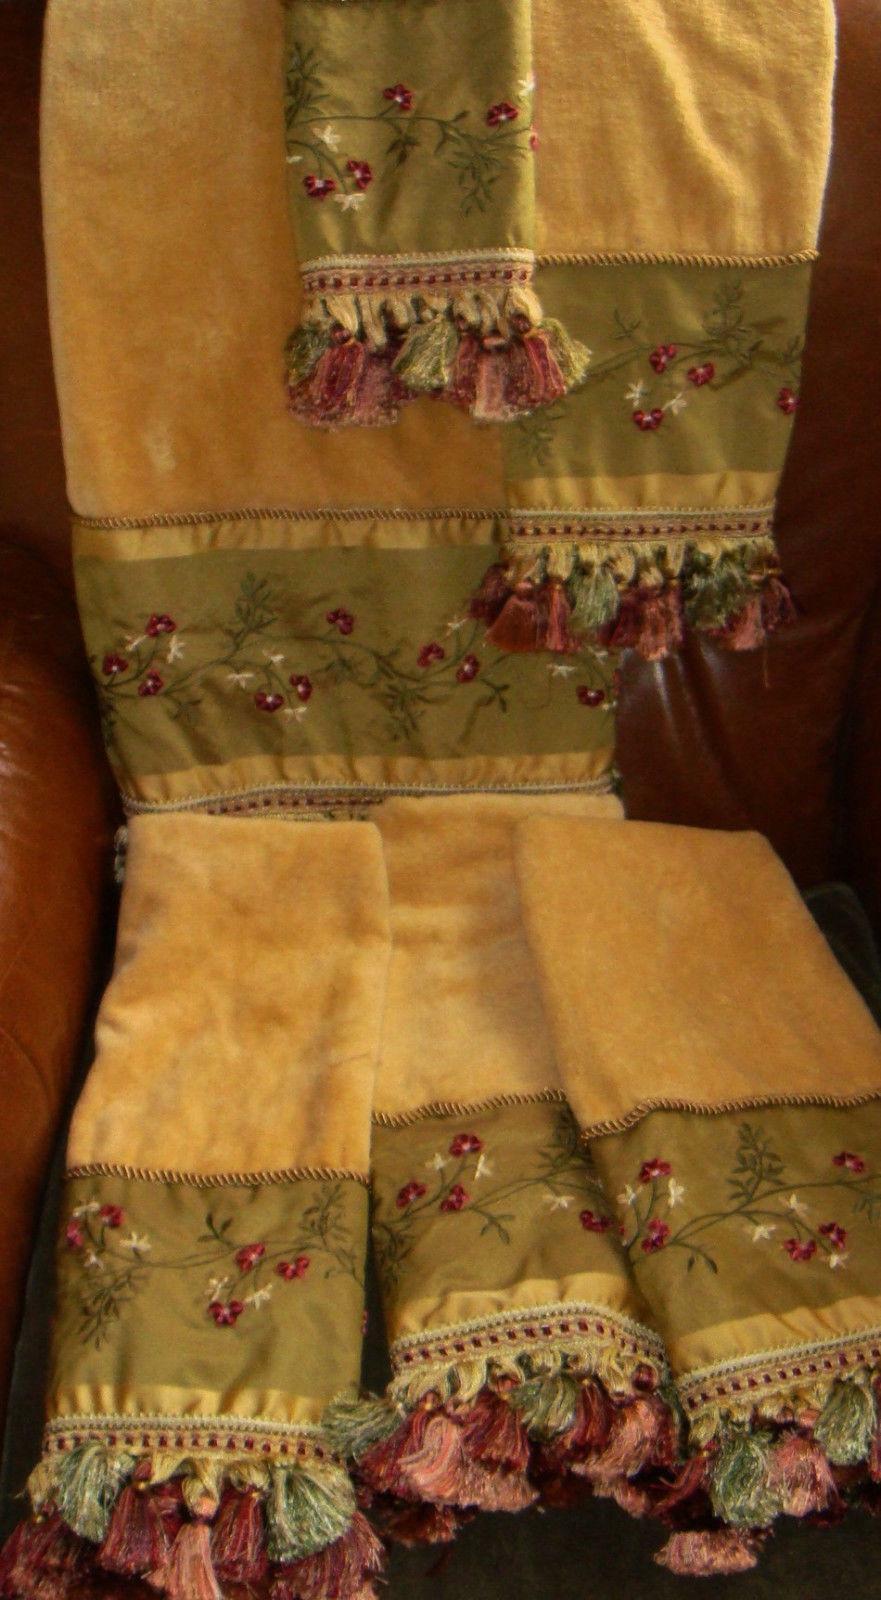 Croscill Home RARE 14 Karat Karat Karat Floral 6 Pieces Bath Hand Fingertip Towels Tassels 4309e8